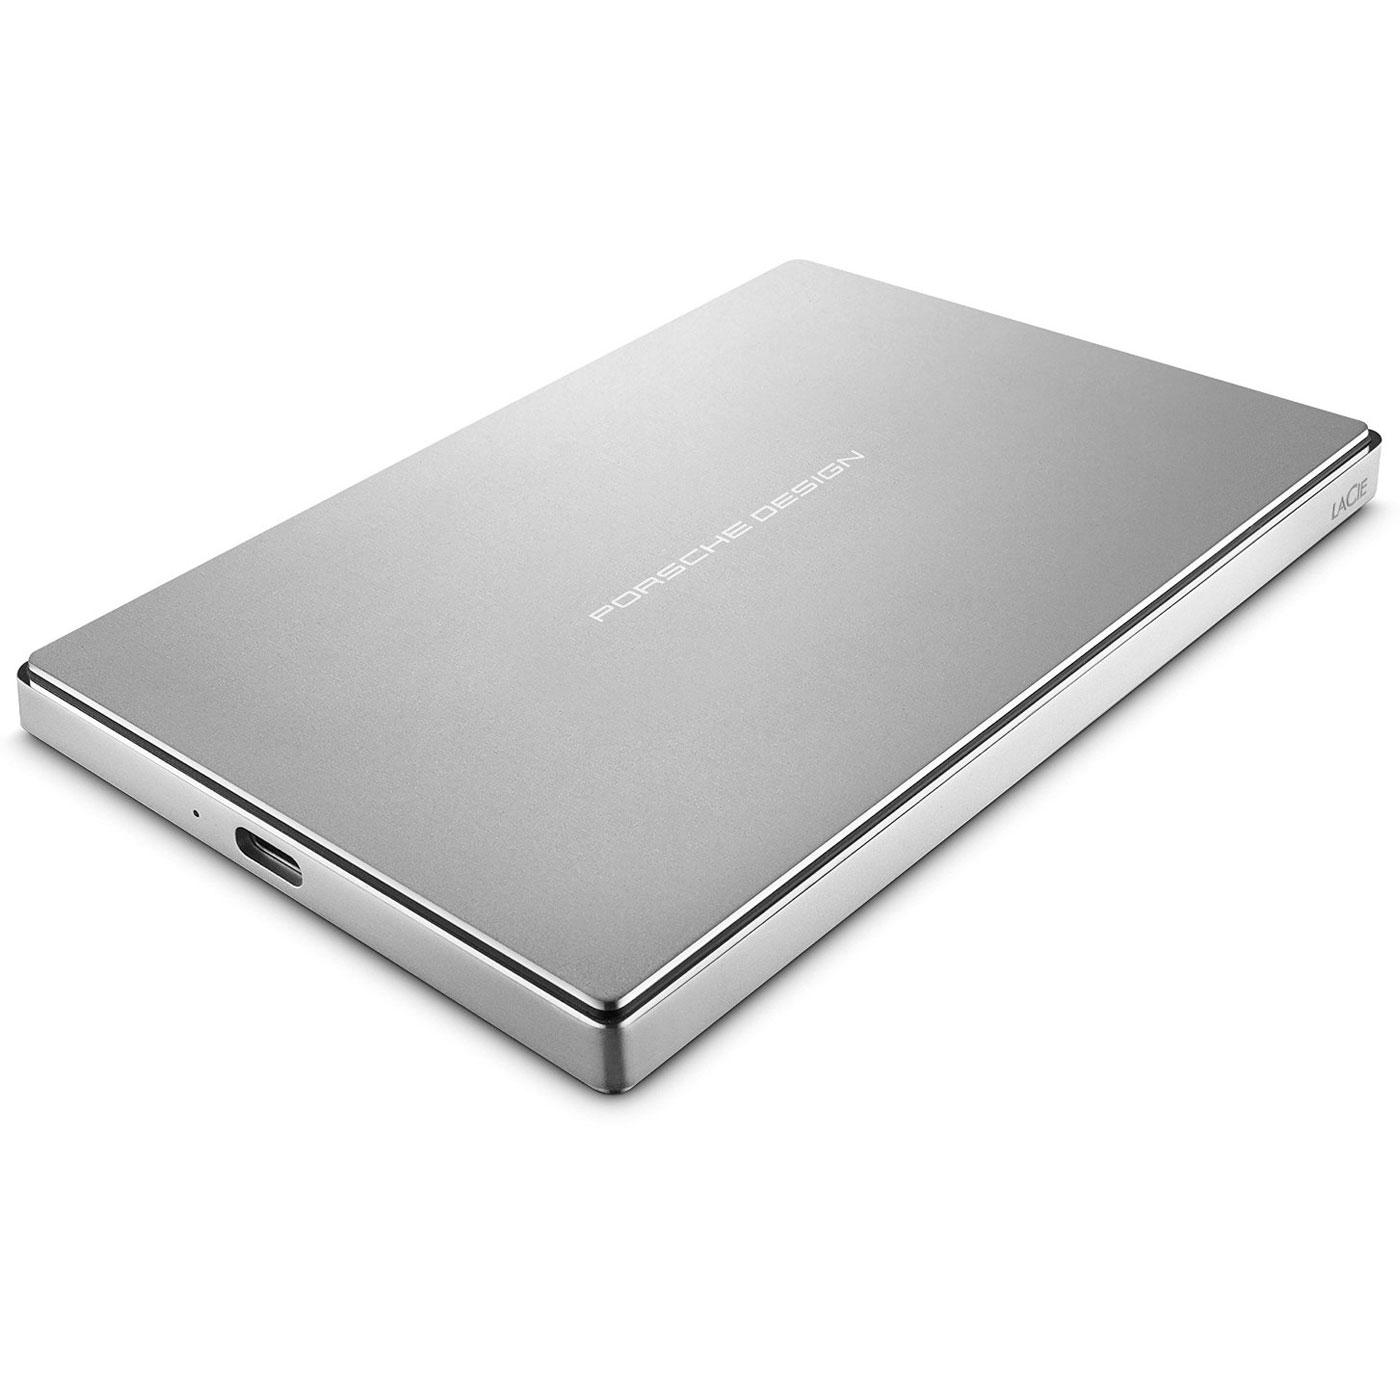 2to disque dur externe